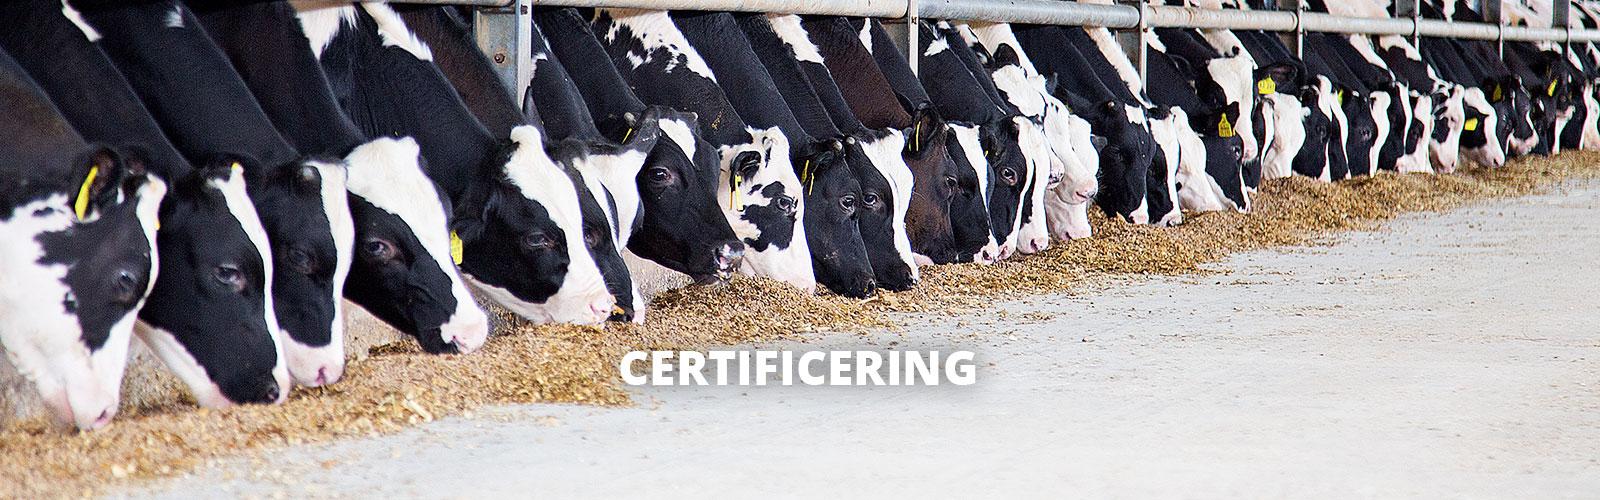 Certificiering-Header